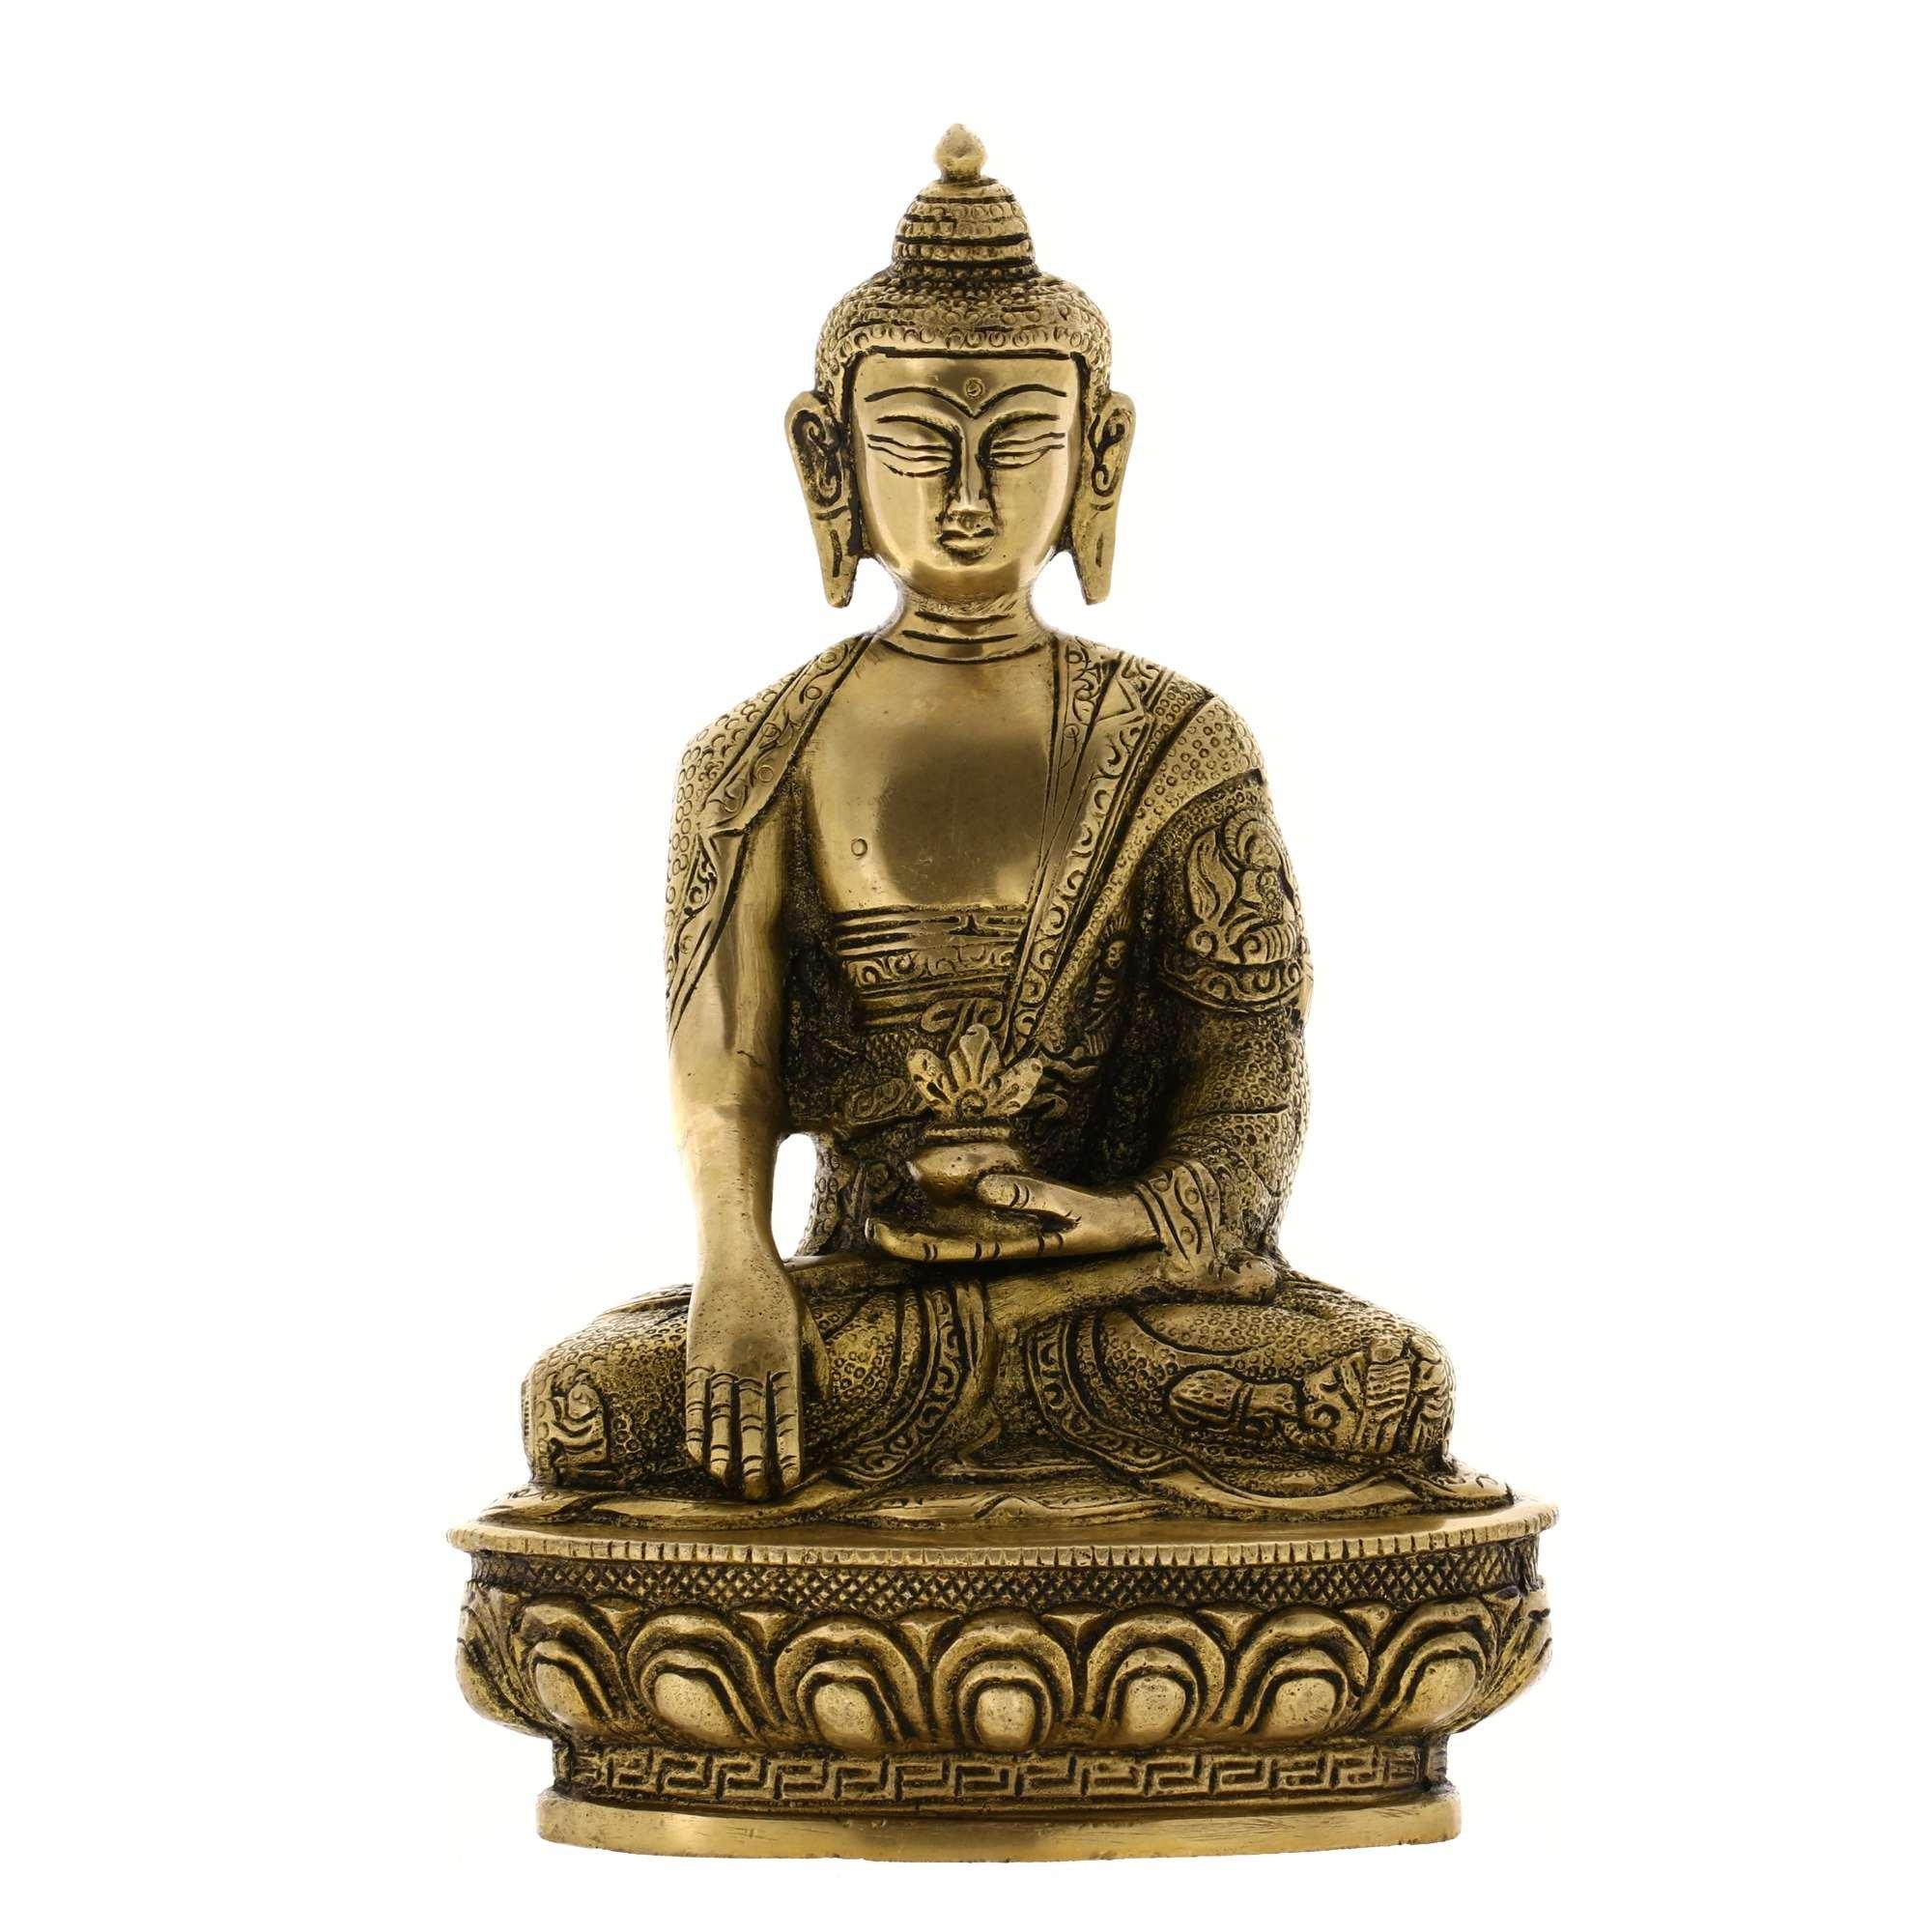 Handmade Seated Buddha Statue Sculpture India Metal Sculpture Spiritual Gifts by ShalinIndia (Image #1)